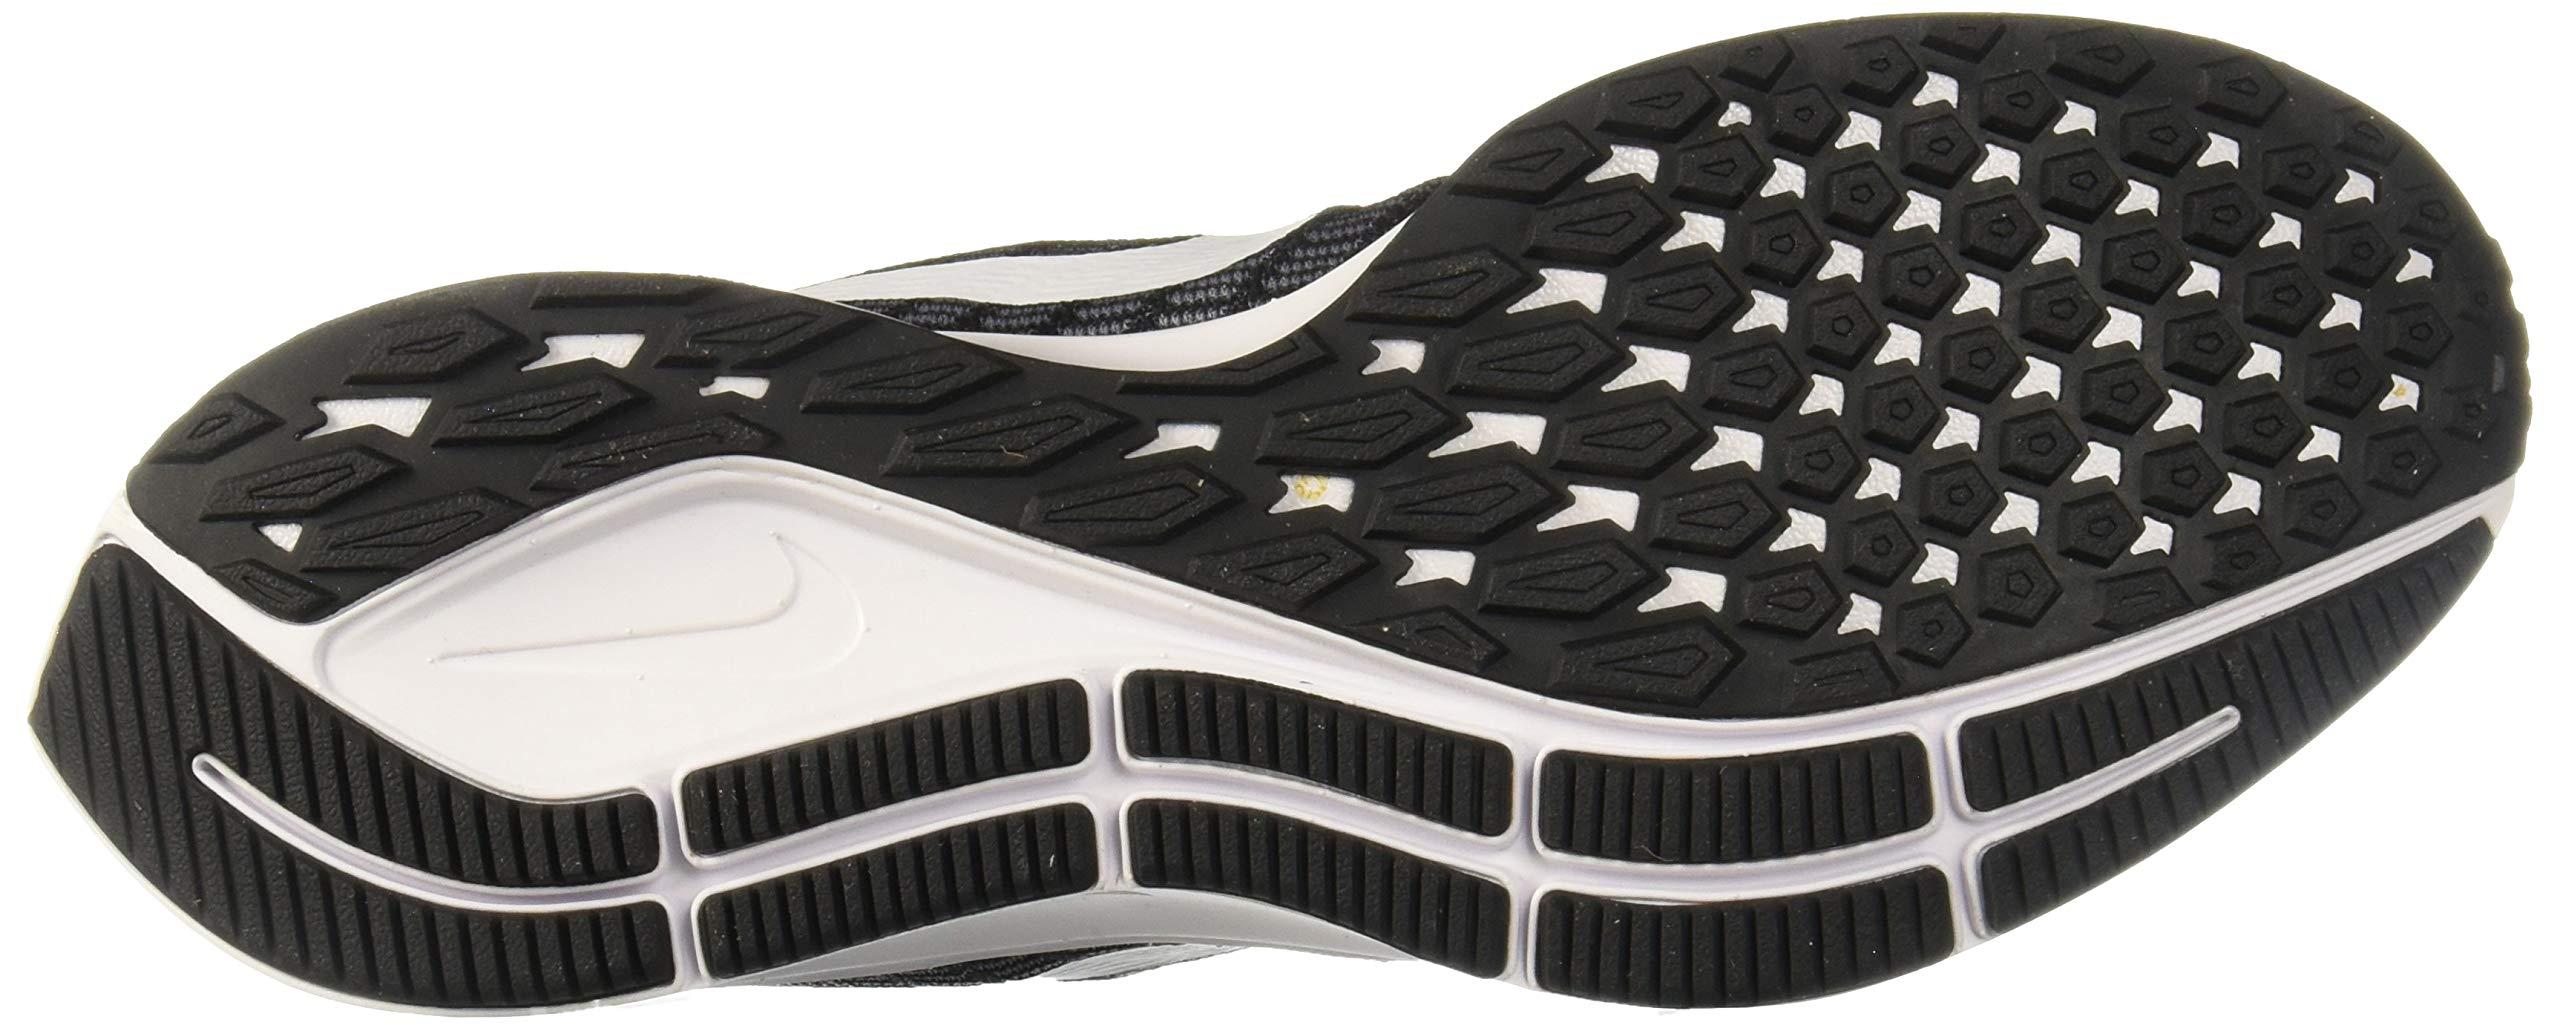 Nike Shox Current Gs Women's Running Shoe (5, Black/Black) by Nike (Image #3)